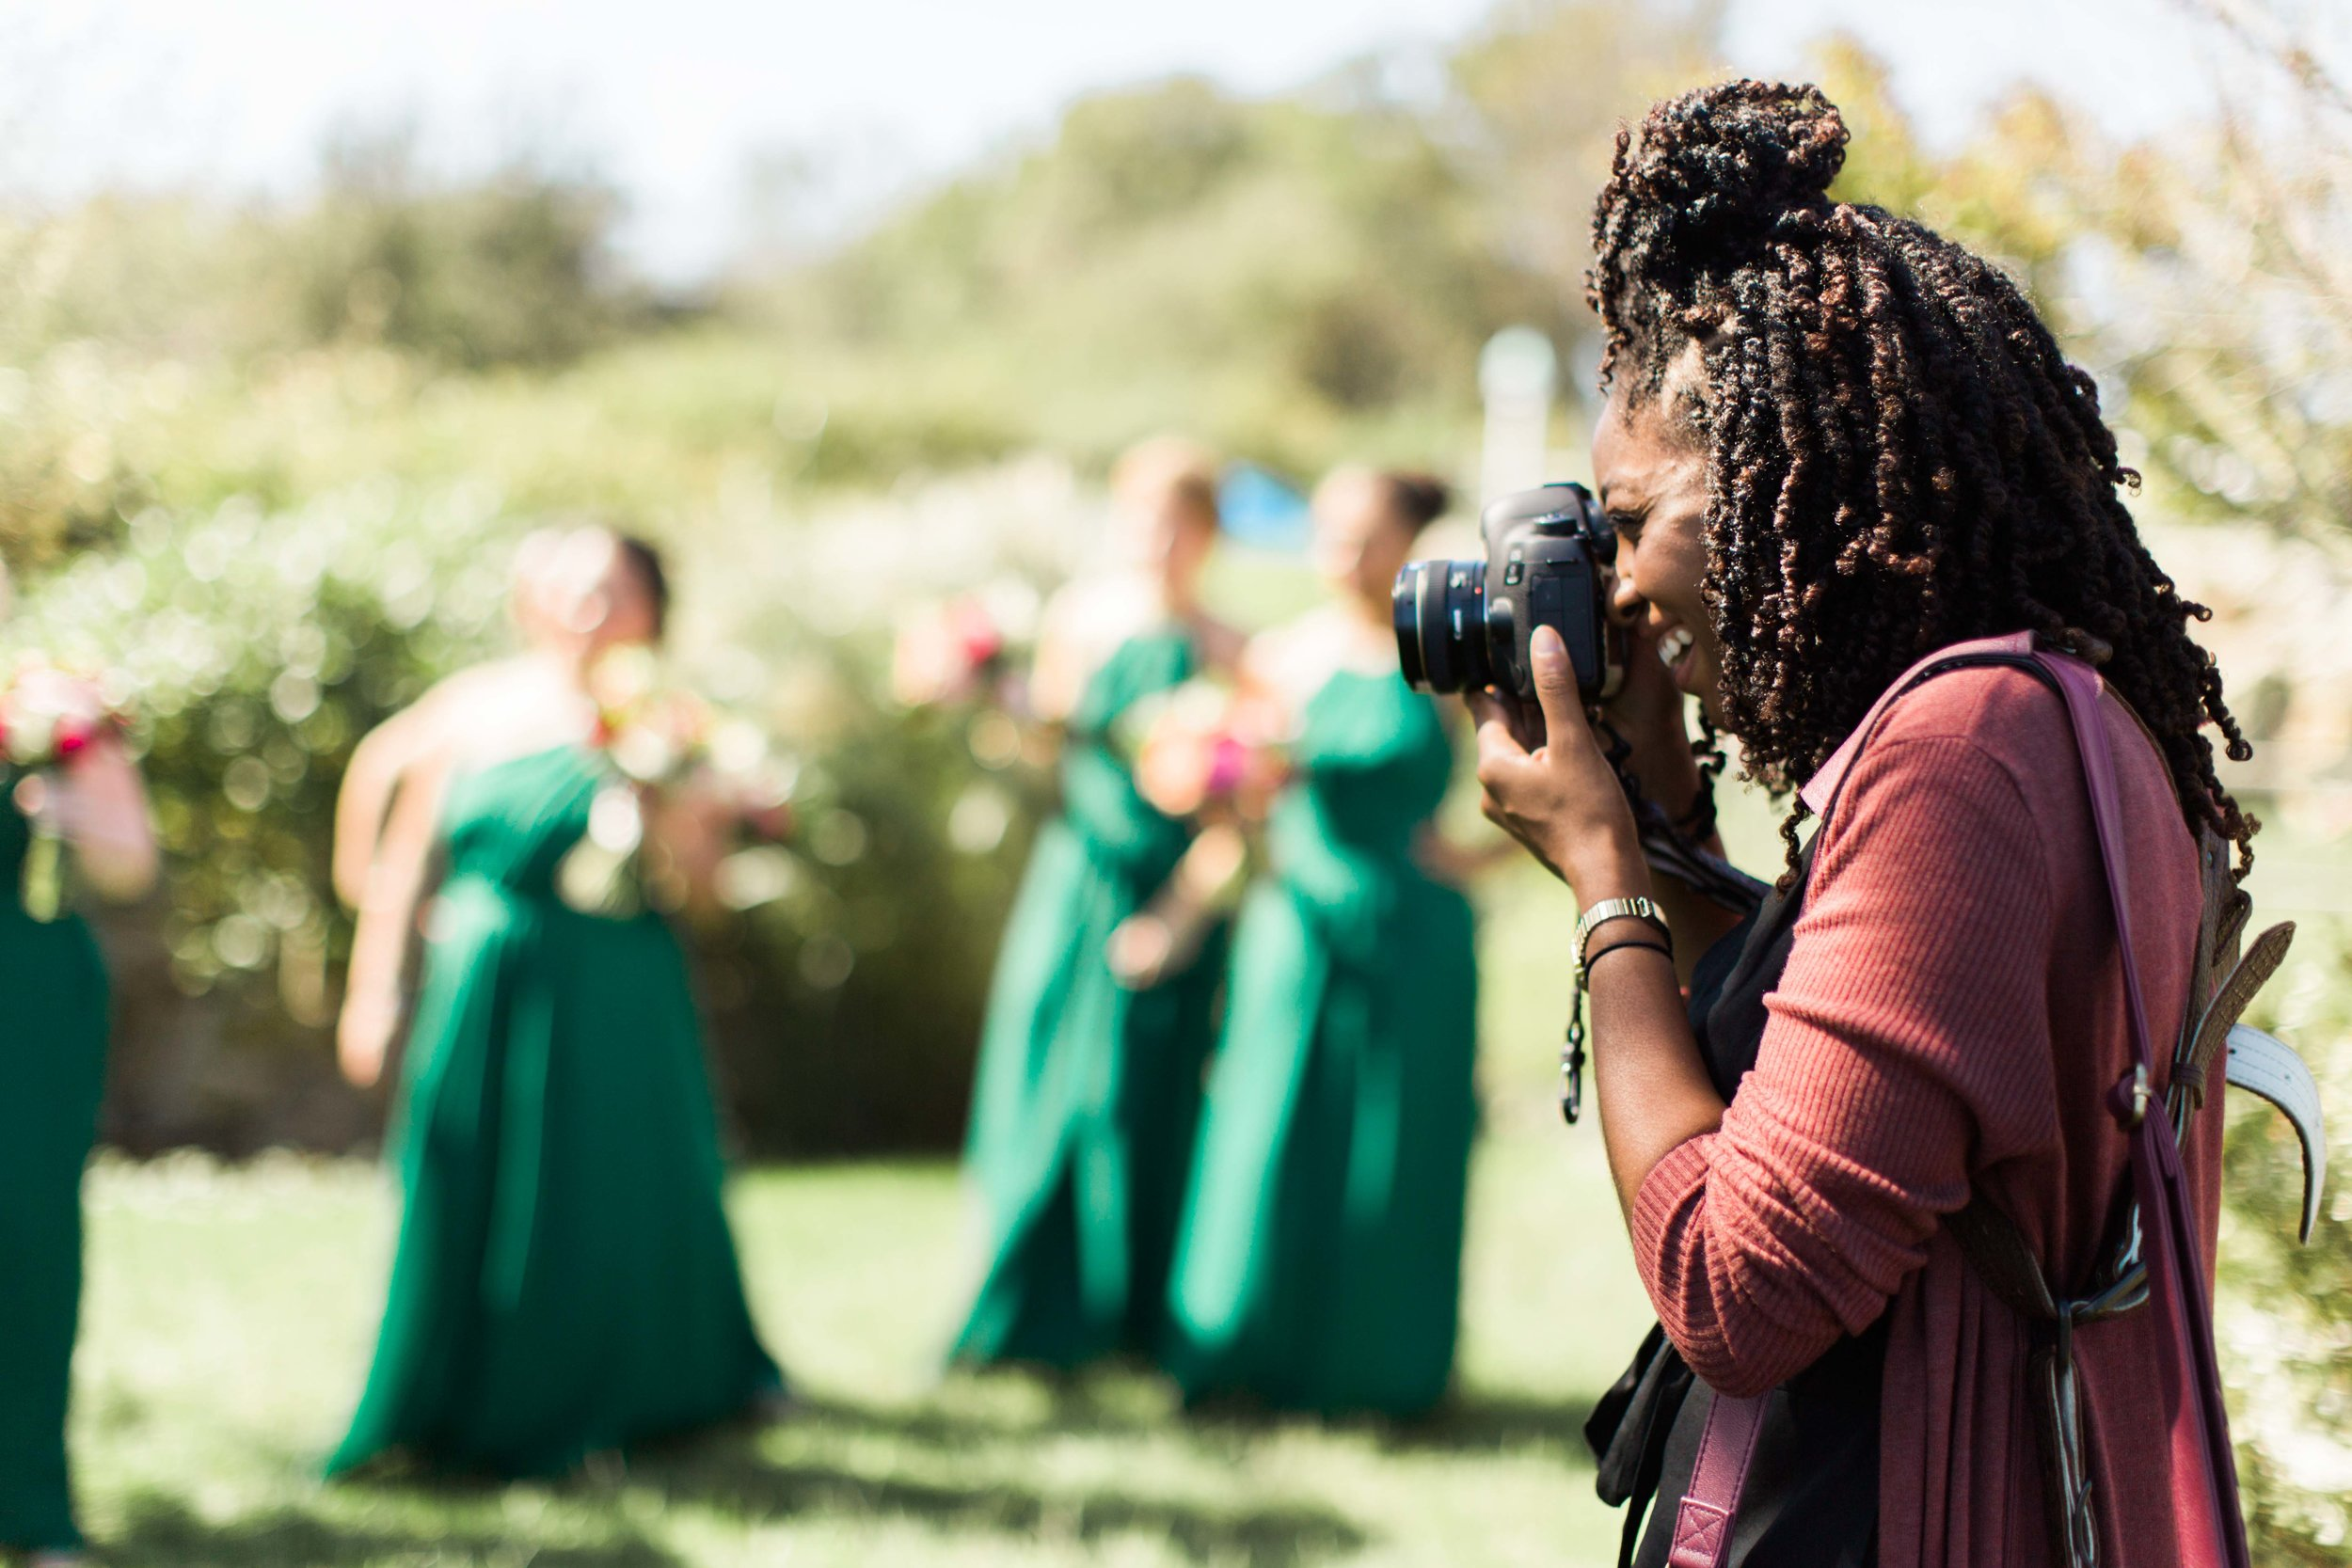 Kiyah-C-photography-Behind-the-scenes-2017-FA4A0217.jpg